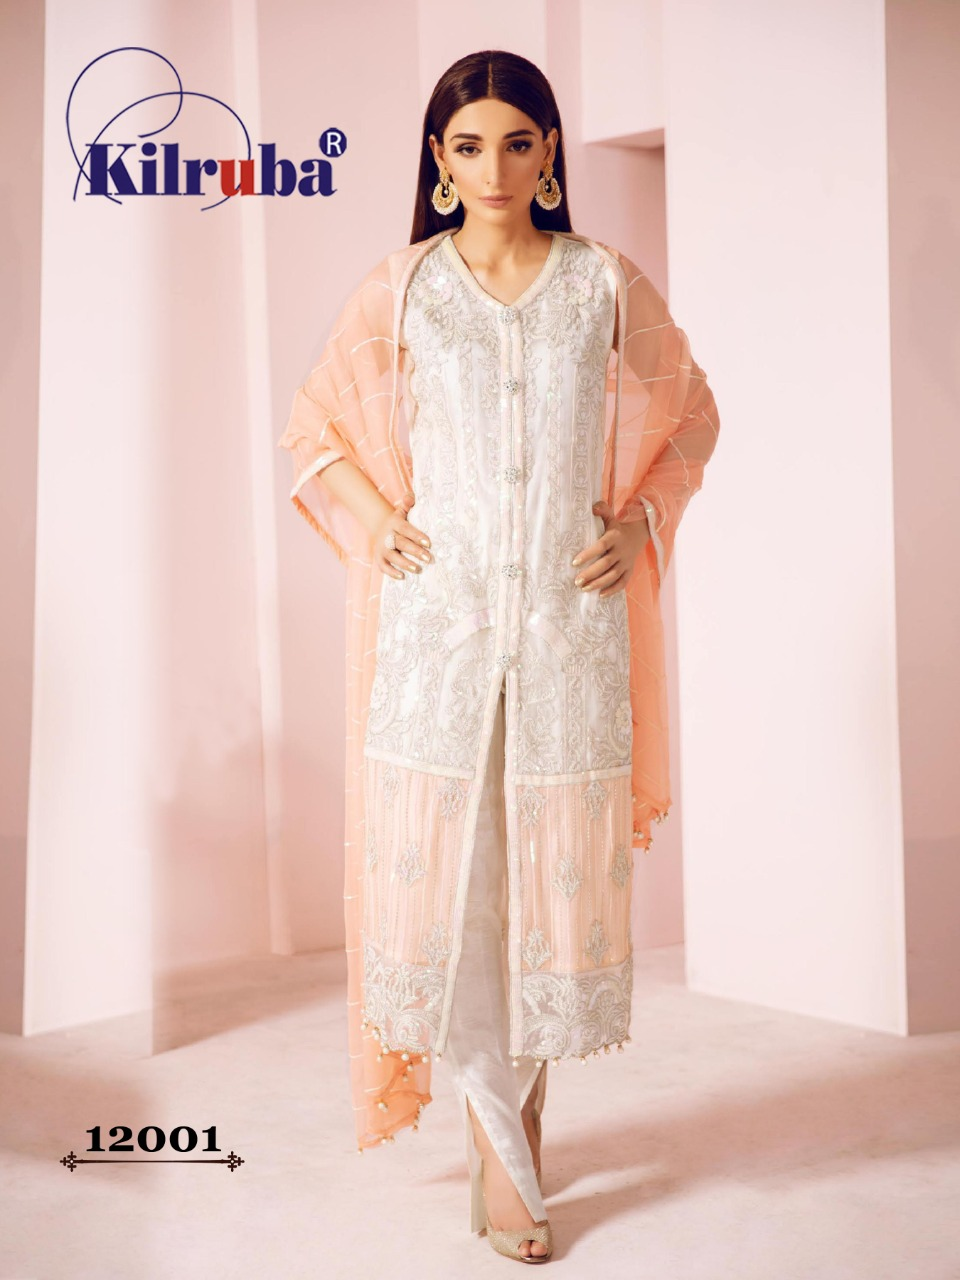 Kilruba Jannat Pakistani Replica Designer Gorgette Butterfly Net Mirror Work And Hand Work Festival And Wedding Wear Suits In Best Wholesale Rate